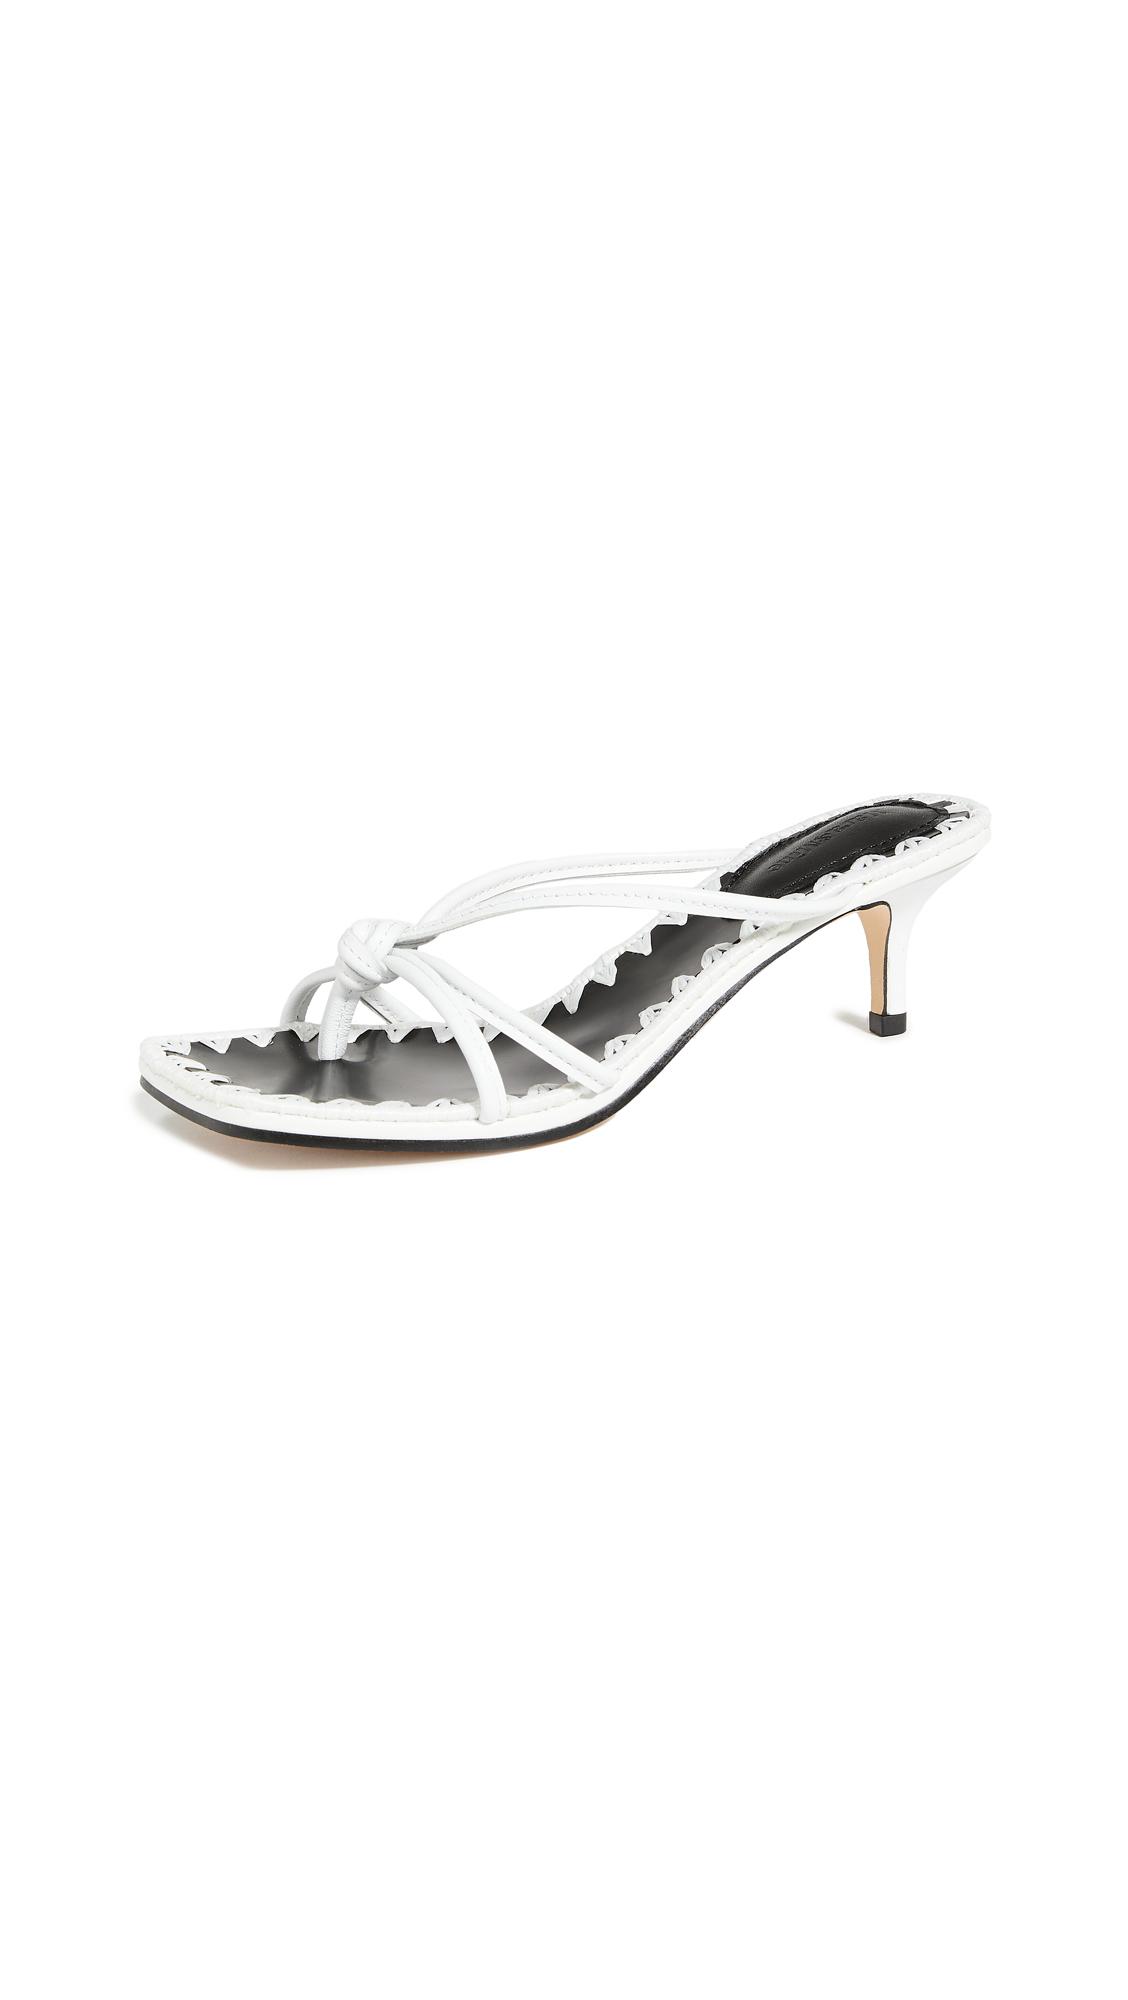 Buy Mara & Mine Azeline Kitten Heel Sandals online, shop Mara & Mine